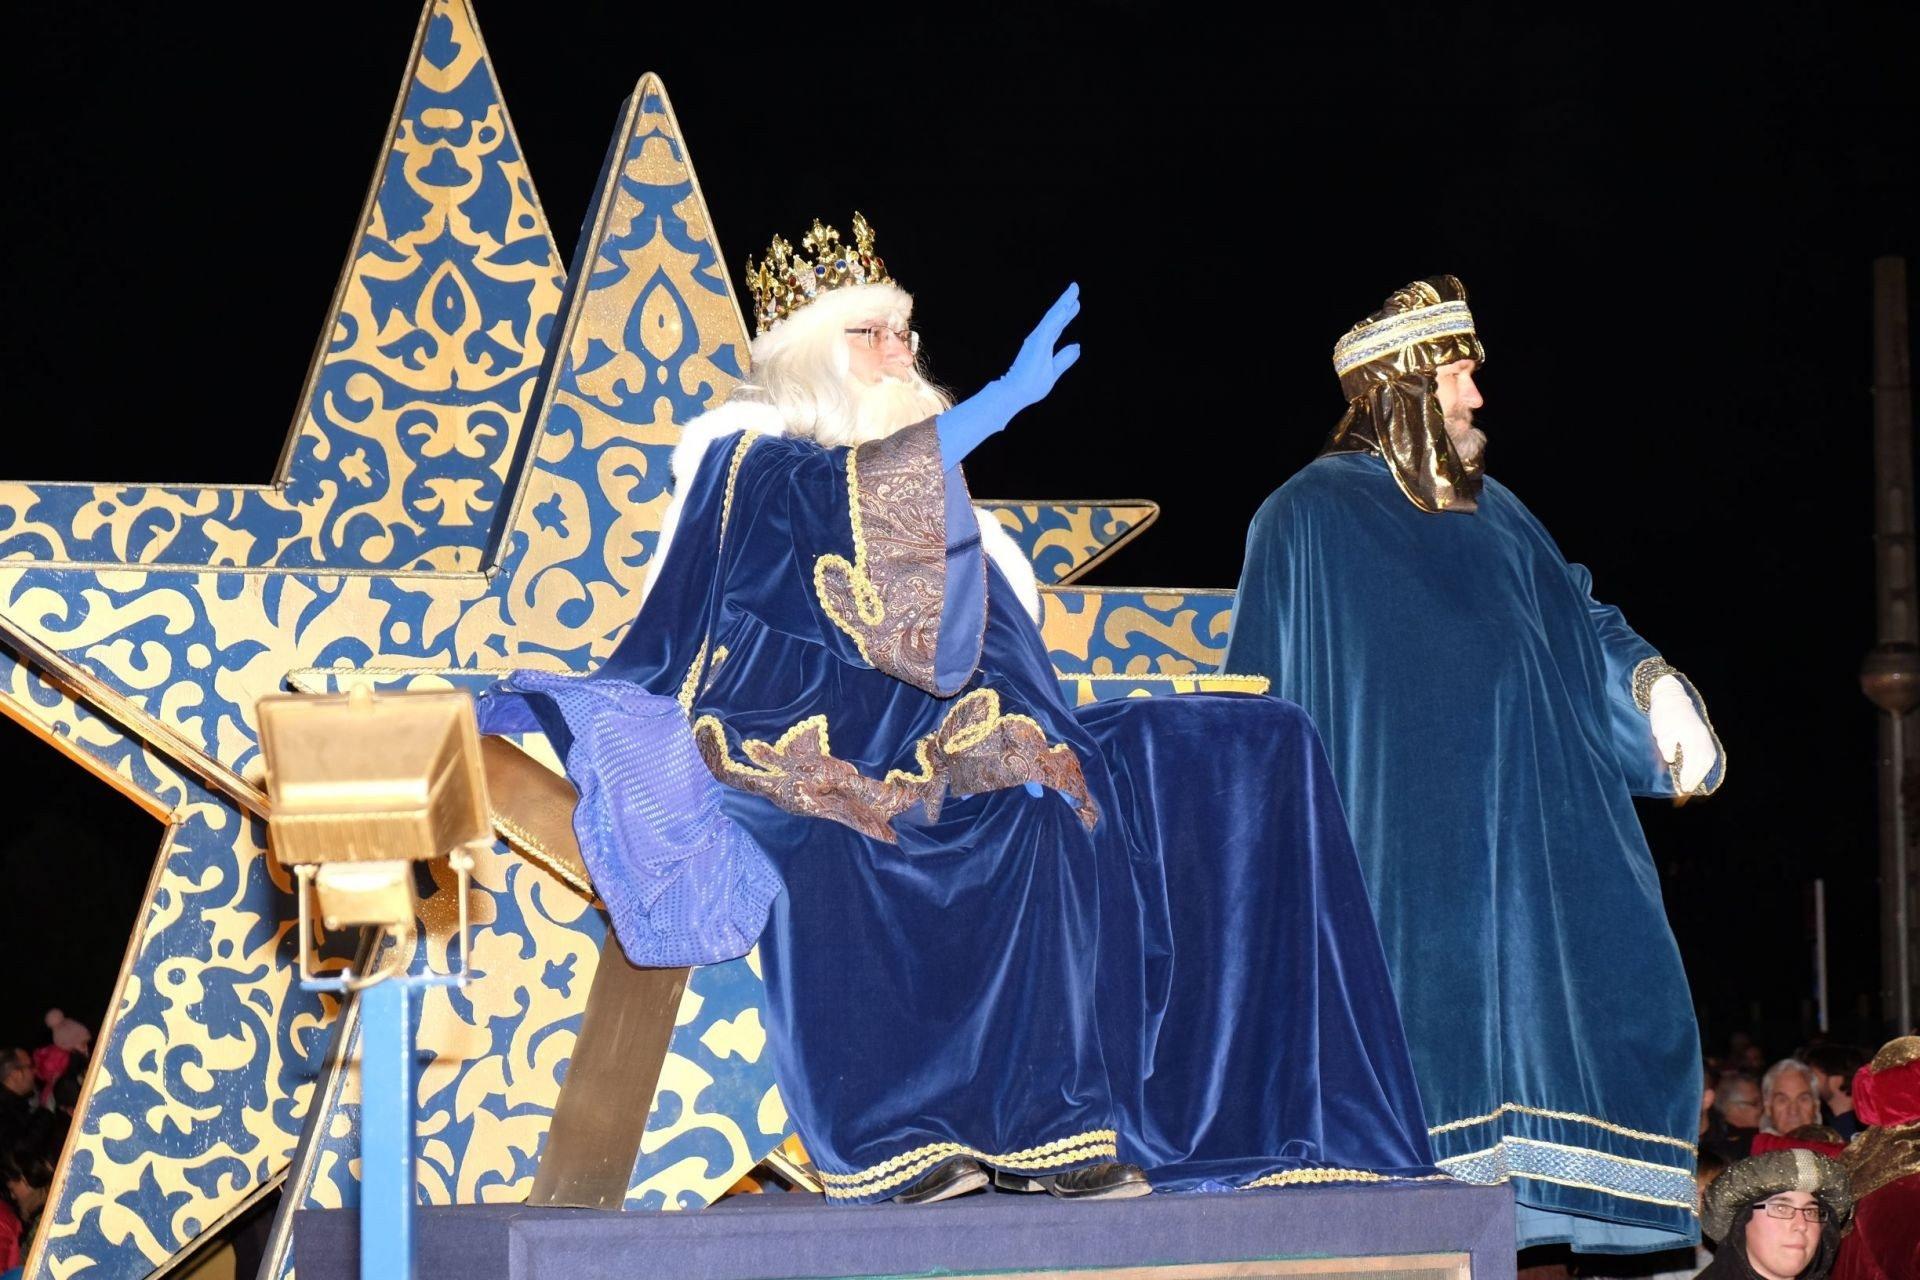 La Cavalcada de Reis. The Three Kings parade